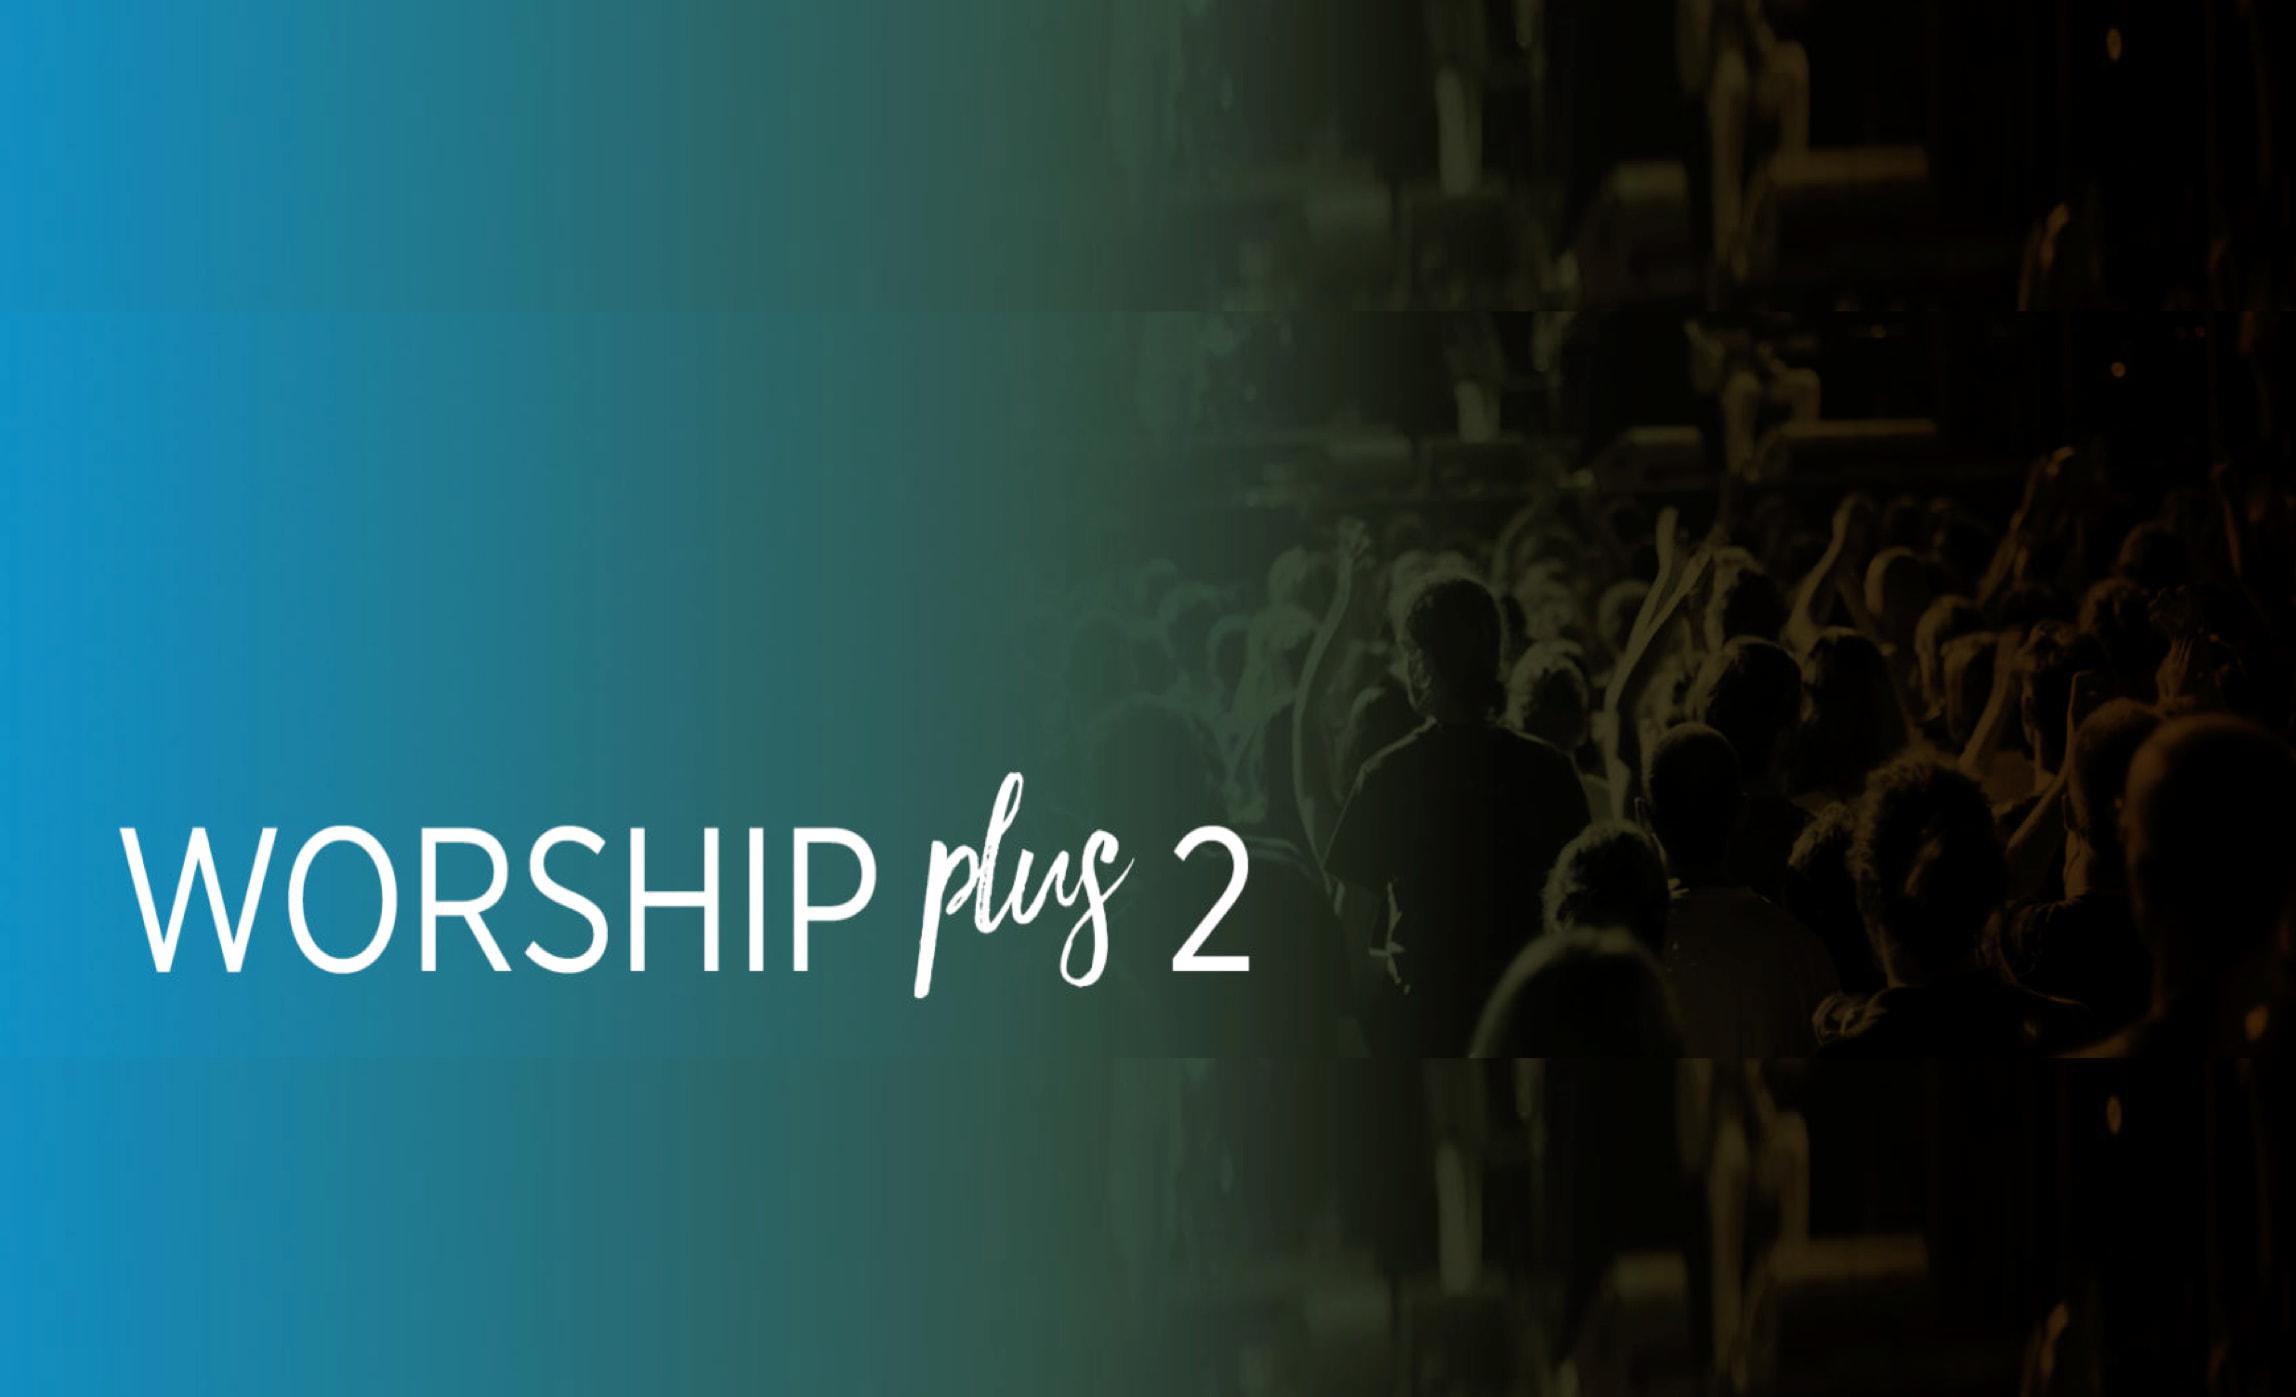 worshipPlus2.jpg